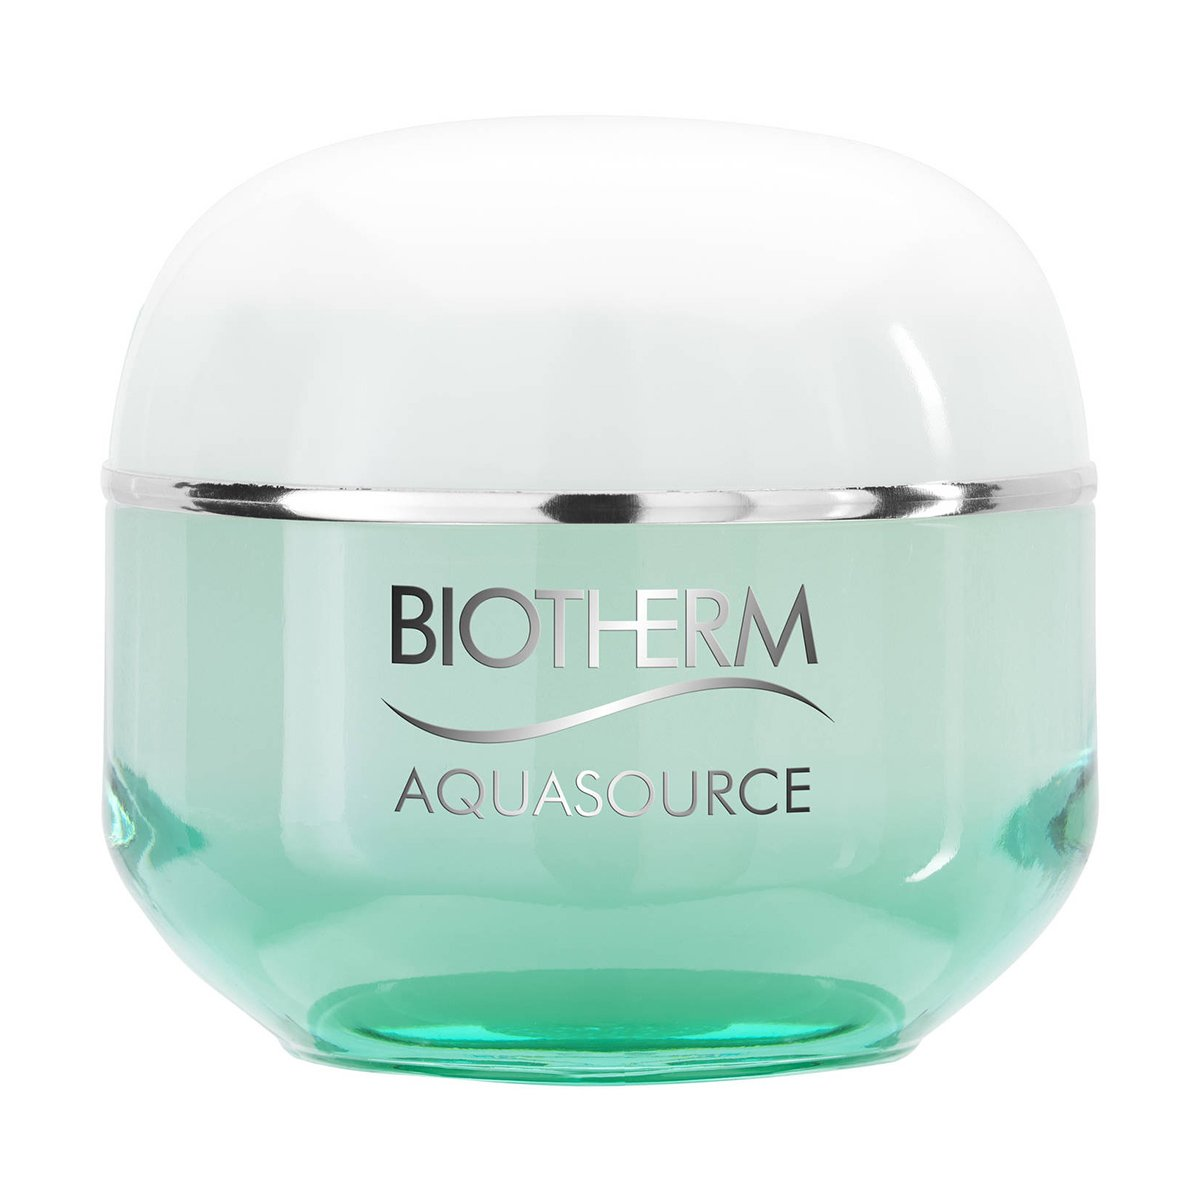 Biotherm - Aquasource Gel - 50 ml